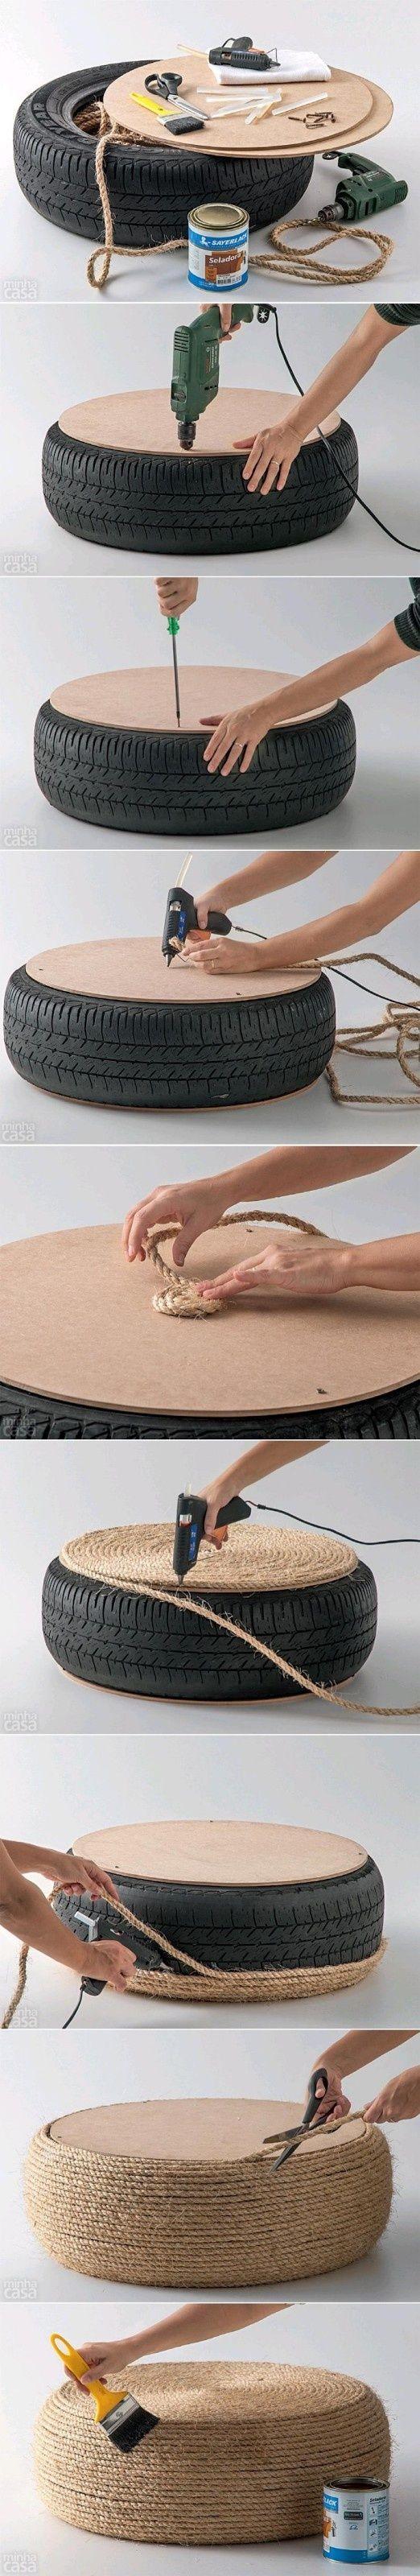 DIY Tire Ottoman... what a transformation...